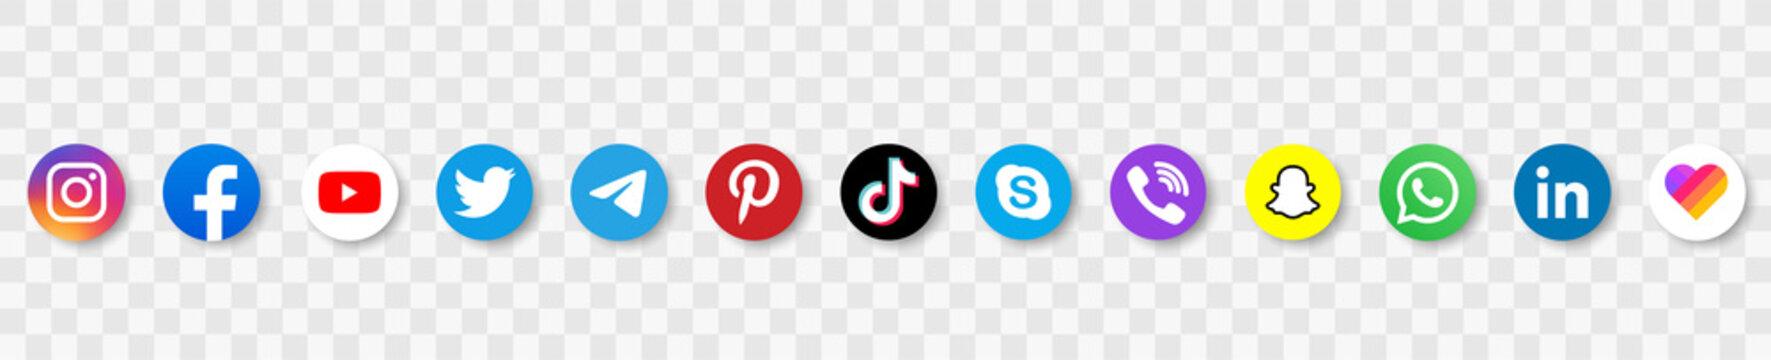 Facebook, twitter, instagram, youtube, snapchat, pinterest, whatsap, periscope, tiktok ,viber - Collection of popular social media logo. Social media icons. Editorial vector. Vector illustration.